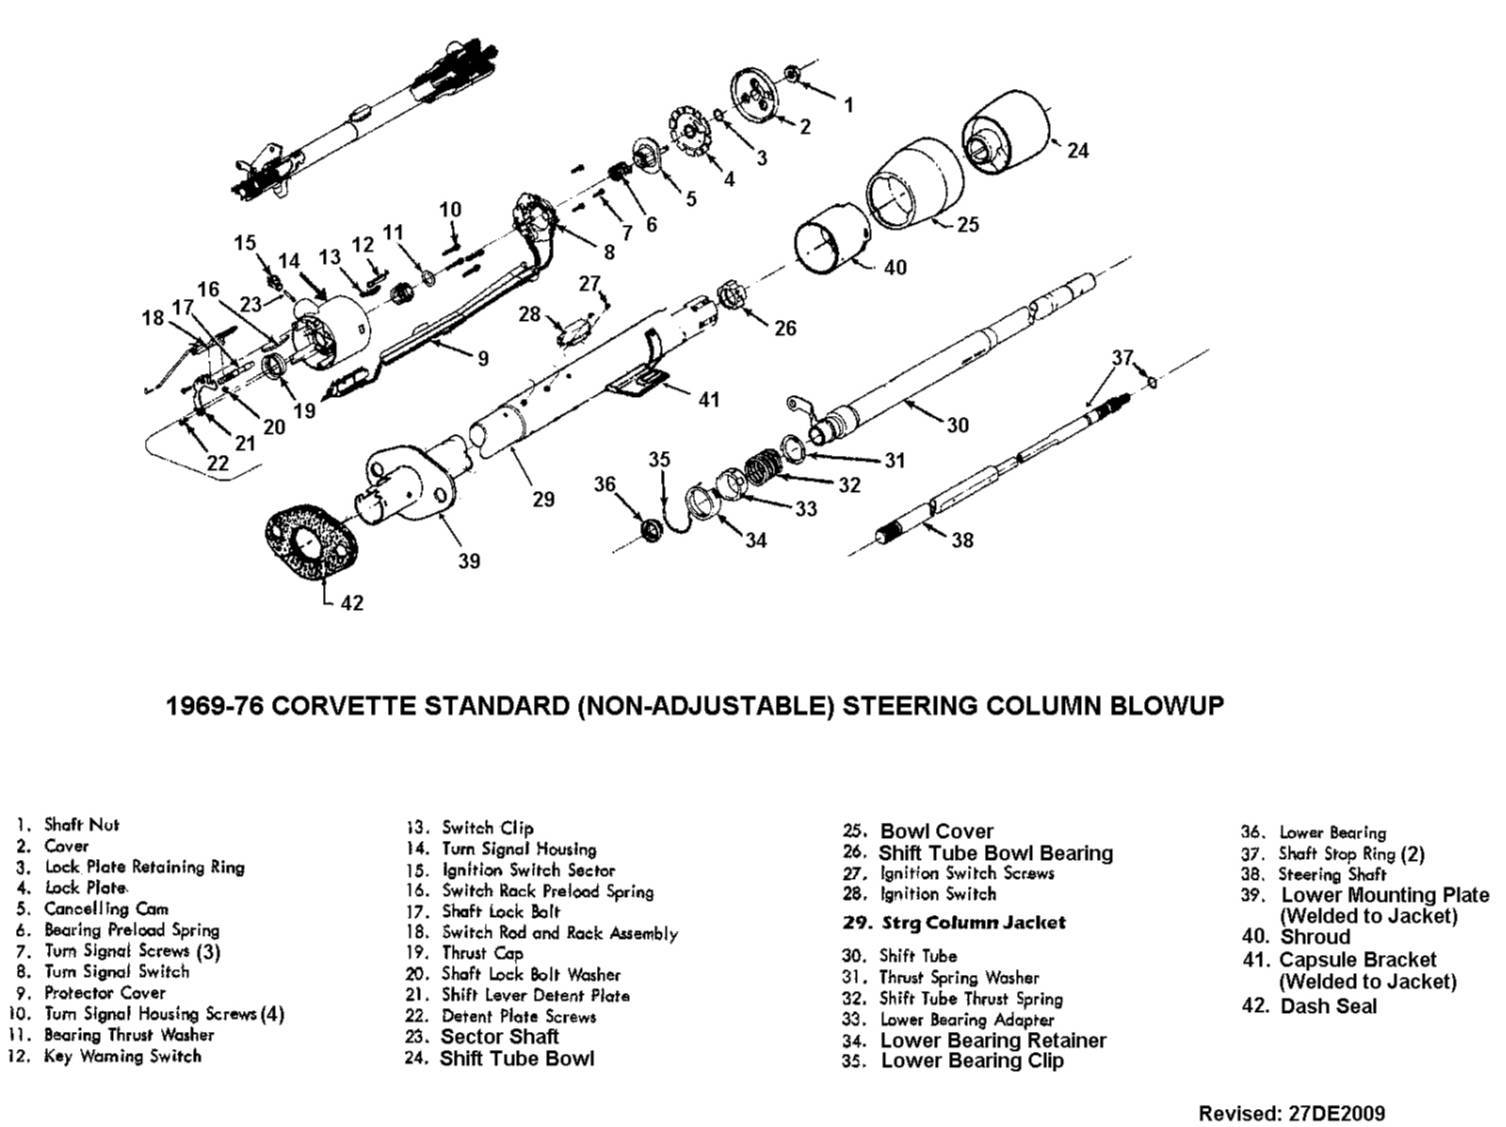 Steering Column Part Id Needed